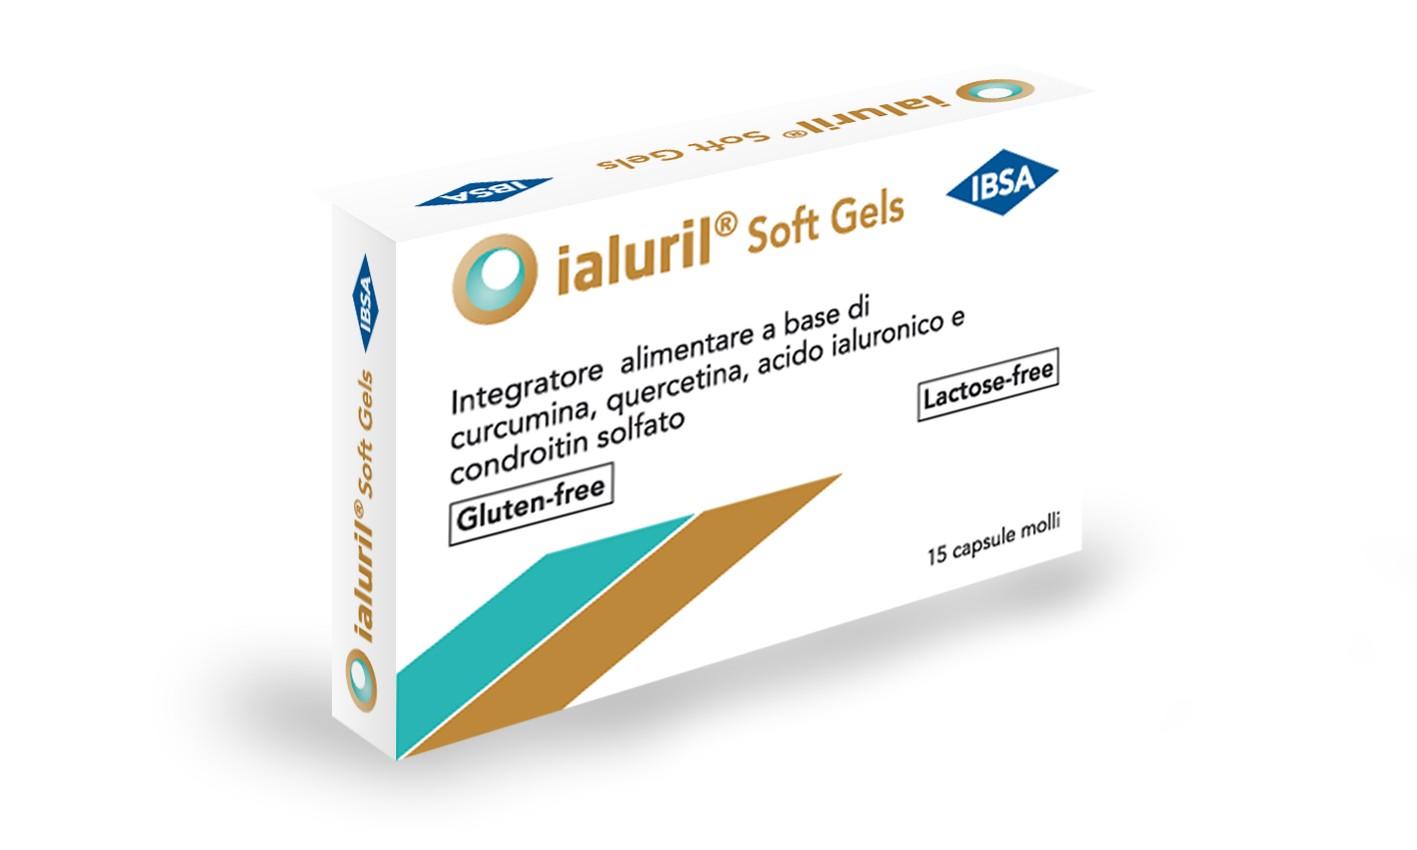 Image of Ialuril Soft Gels Integratore Alimentare 30 Capsule 935251456